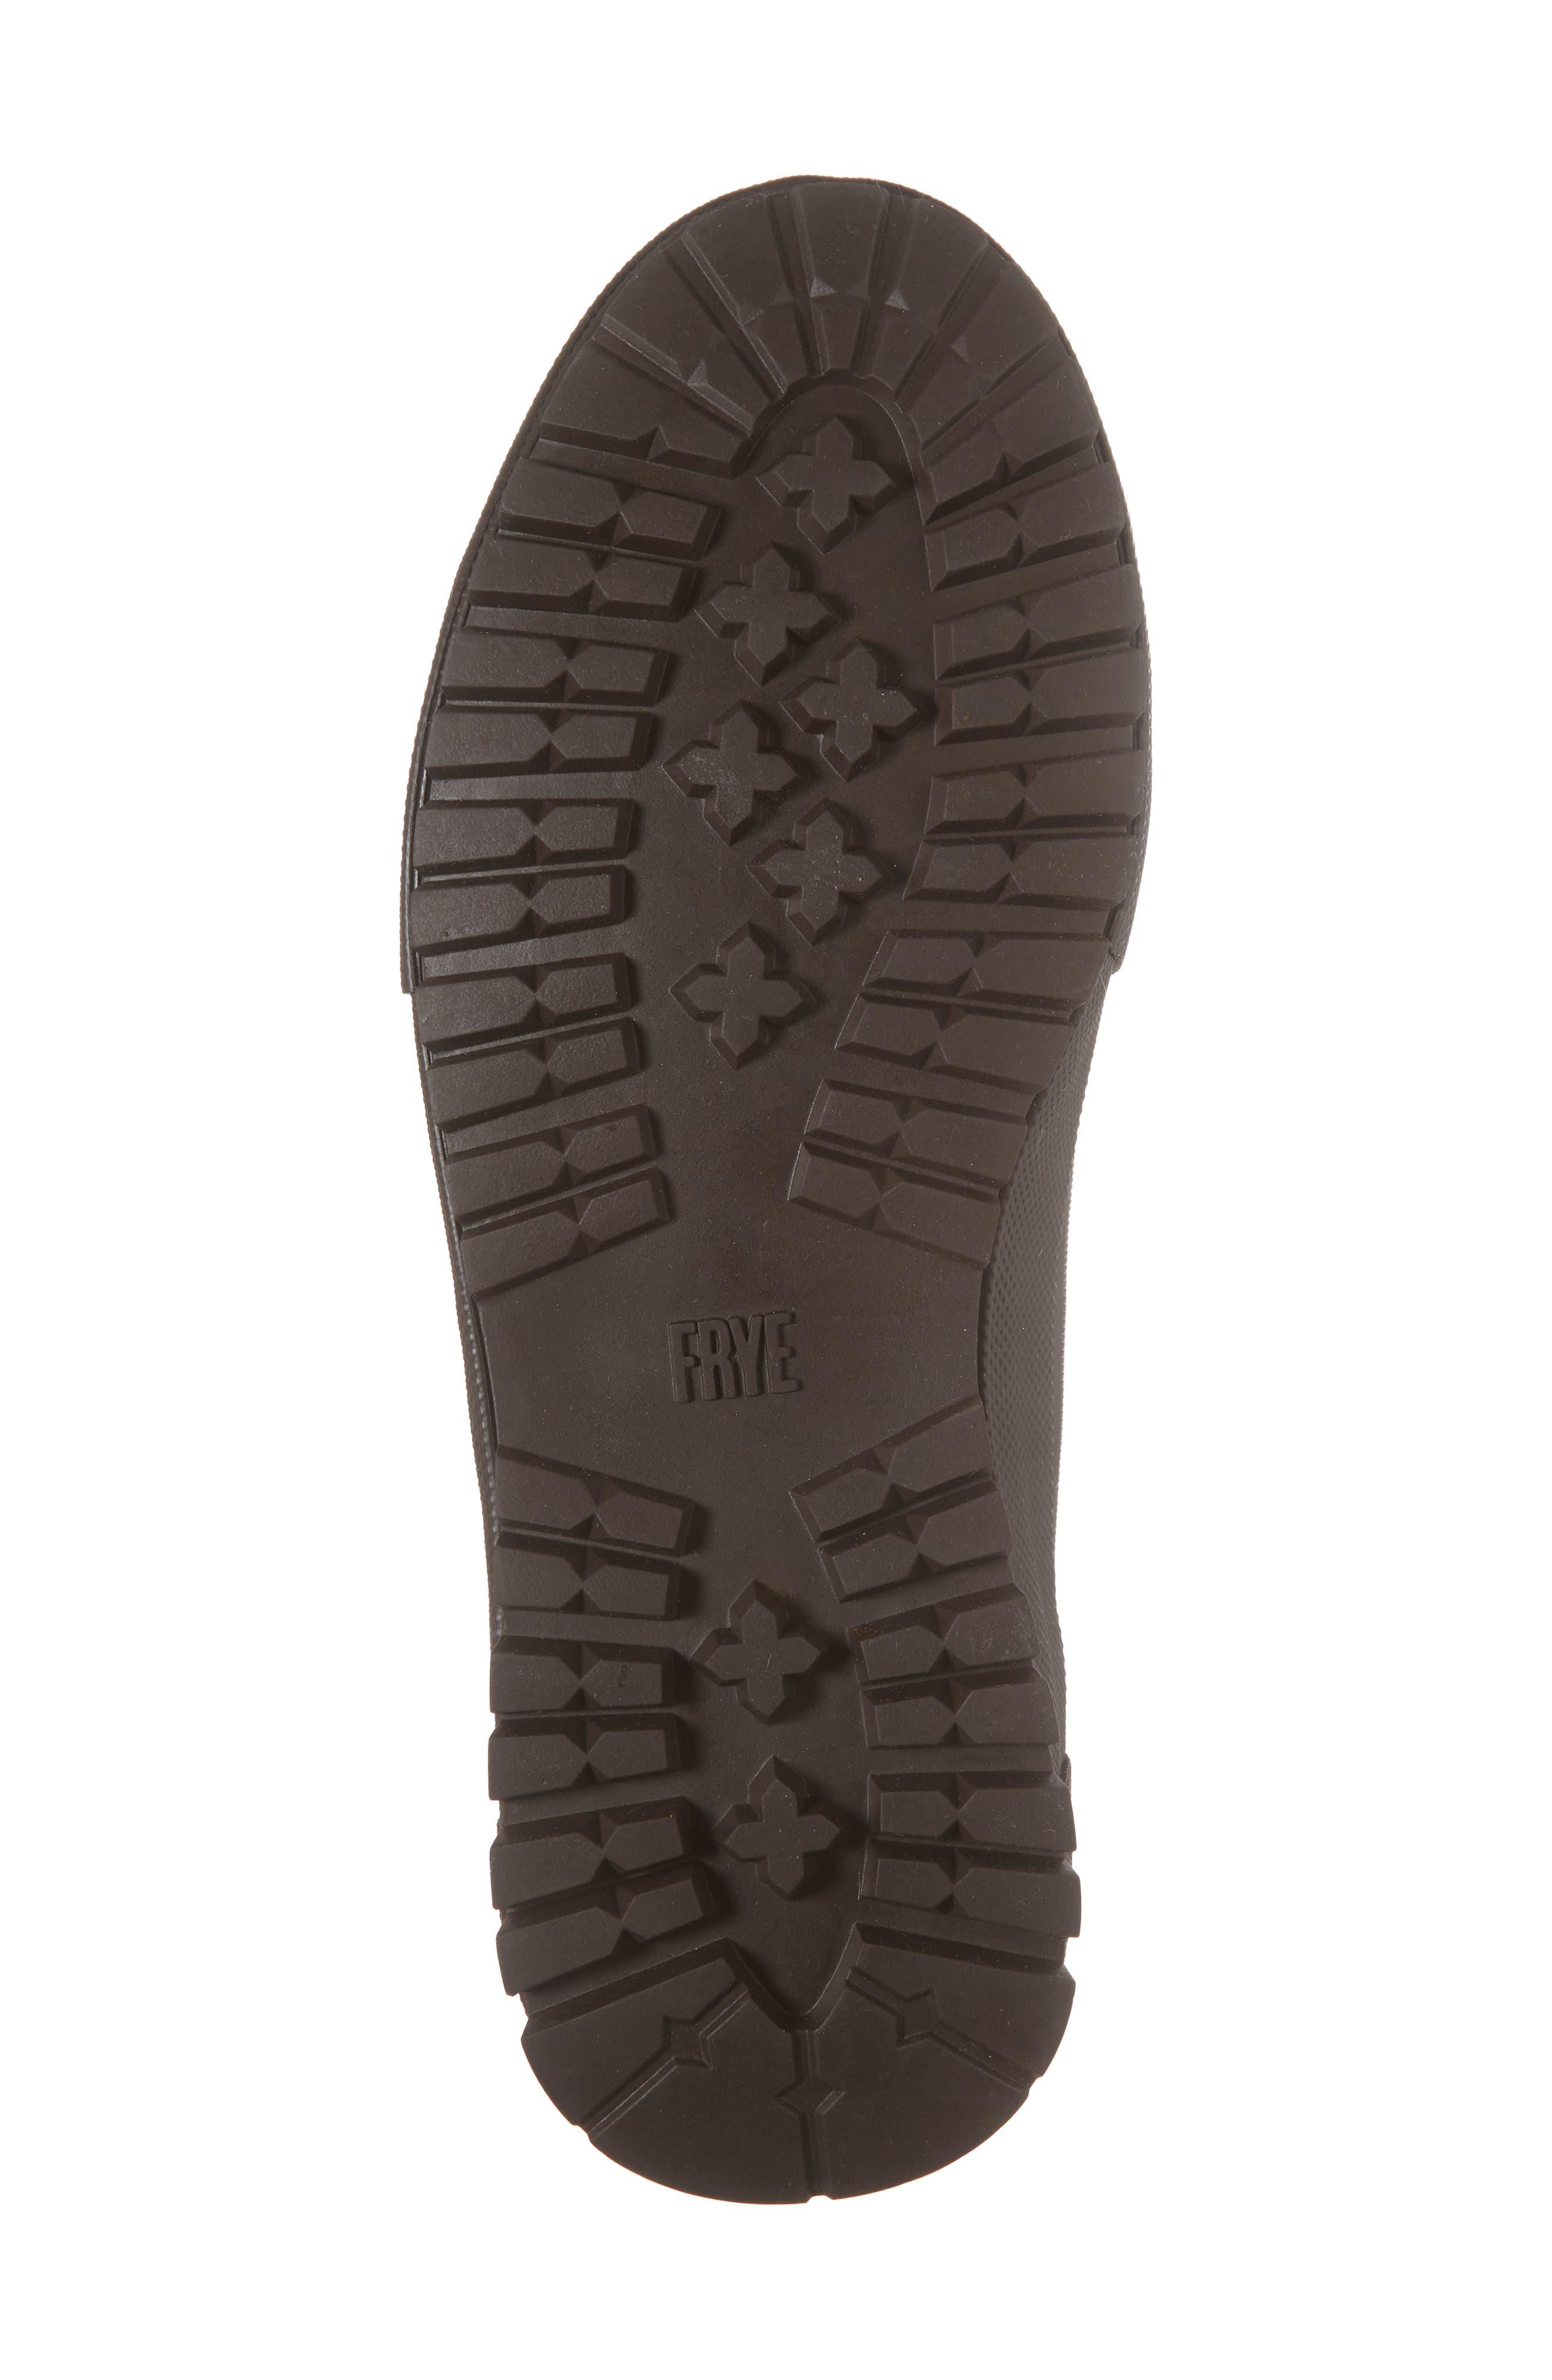 Ryan Lugged Sneaker Boot,                             Alternate thumbnail 6, color,                             Tan Canvas